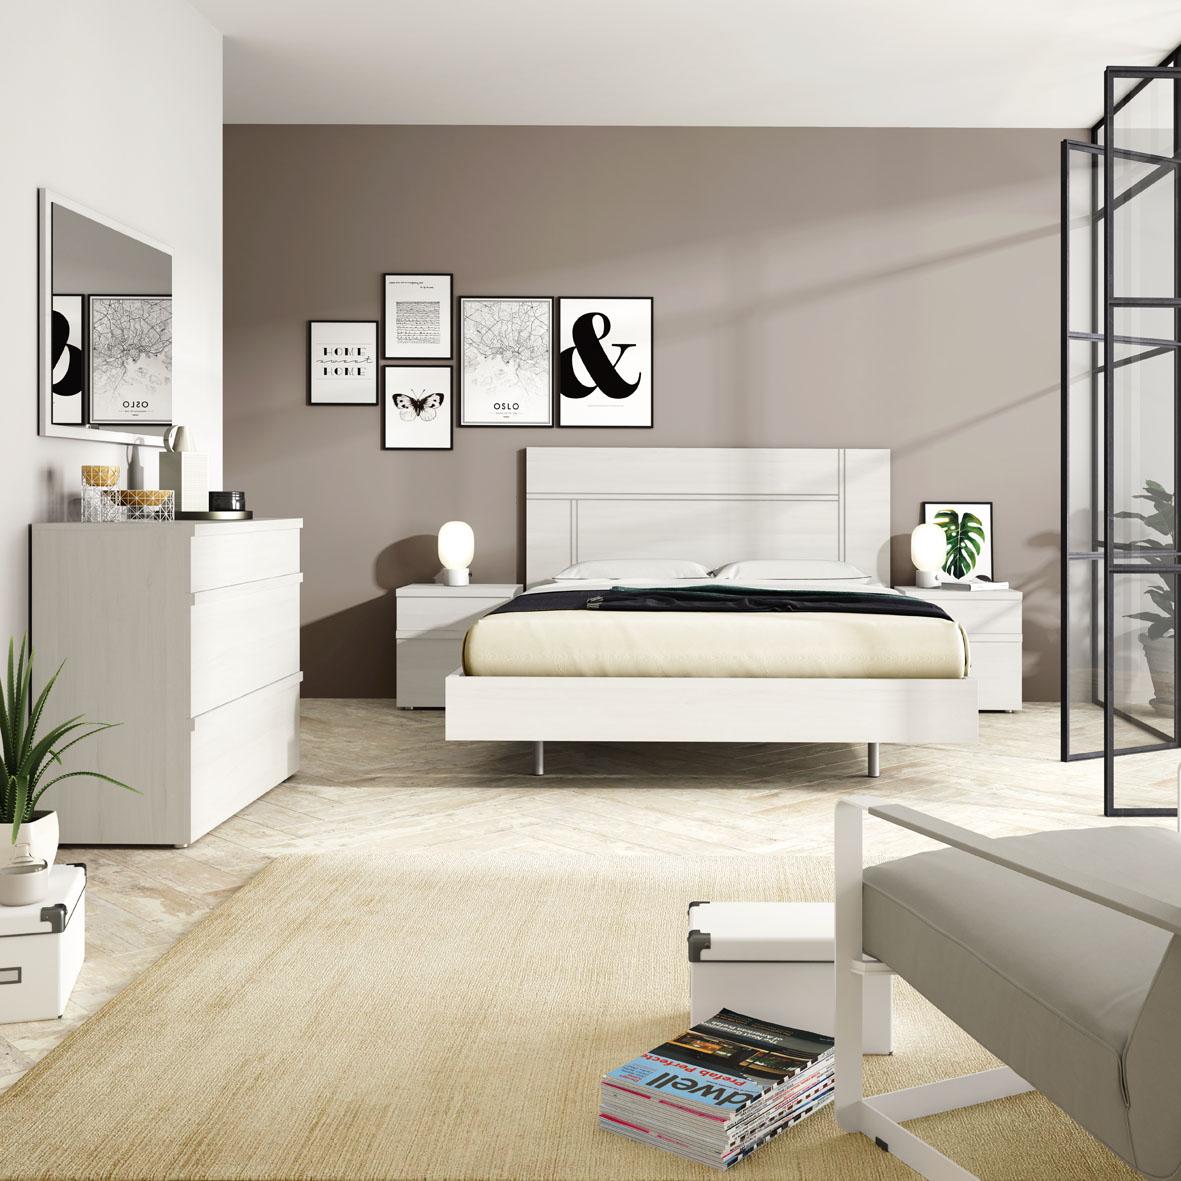 dormitorios-modernos-Neo.2-muebles-paco-caballero-907-5d10b20ca351b